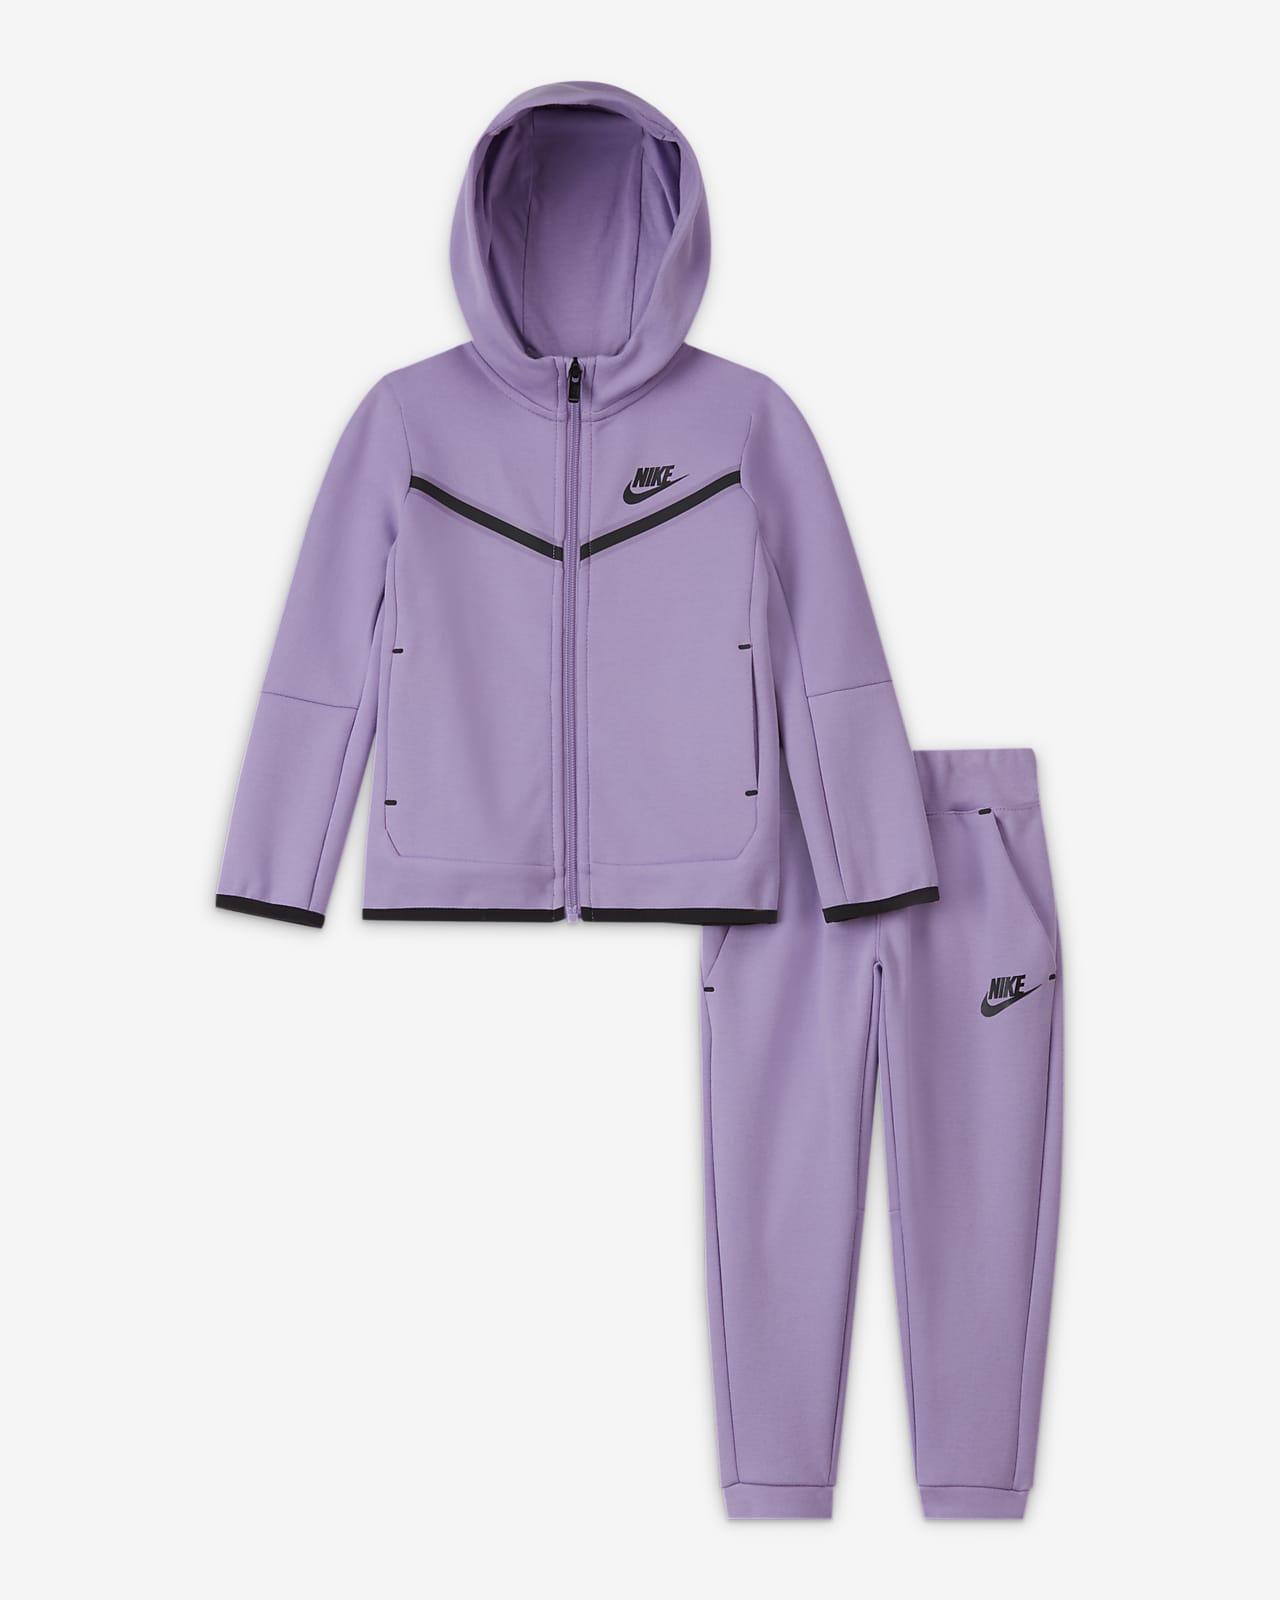 Nike Sportswear Tech Fleece Conjunt de dessuadora amb caputxa i cremallera i pantalons - Infant